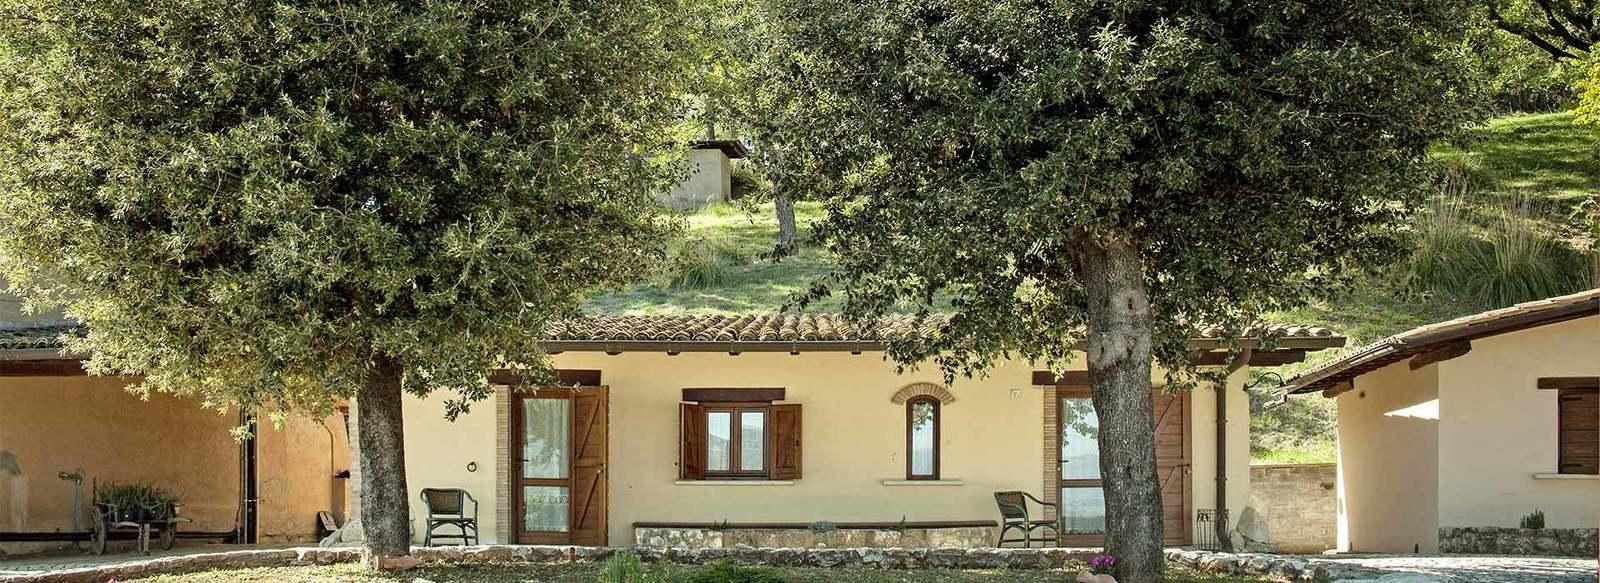 Silenzio, relax e natura - struttura